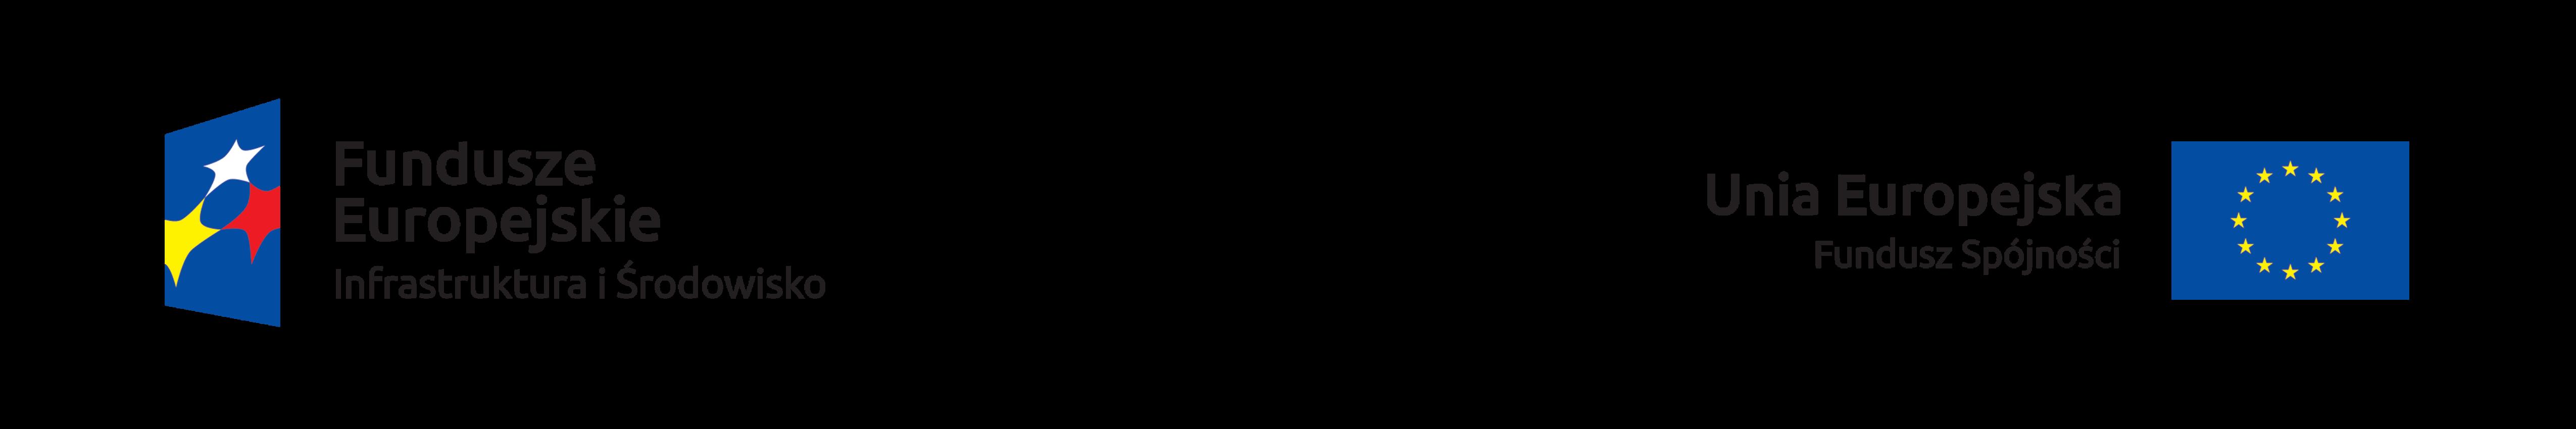 logo_poziom_FE_i_UE